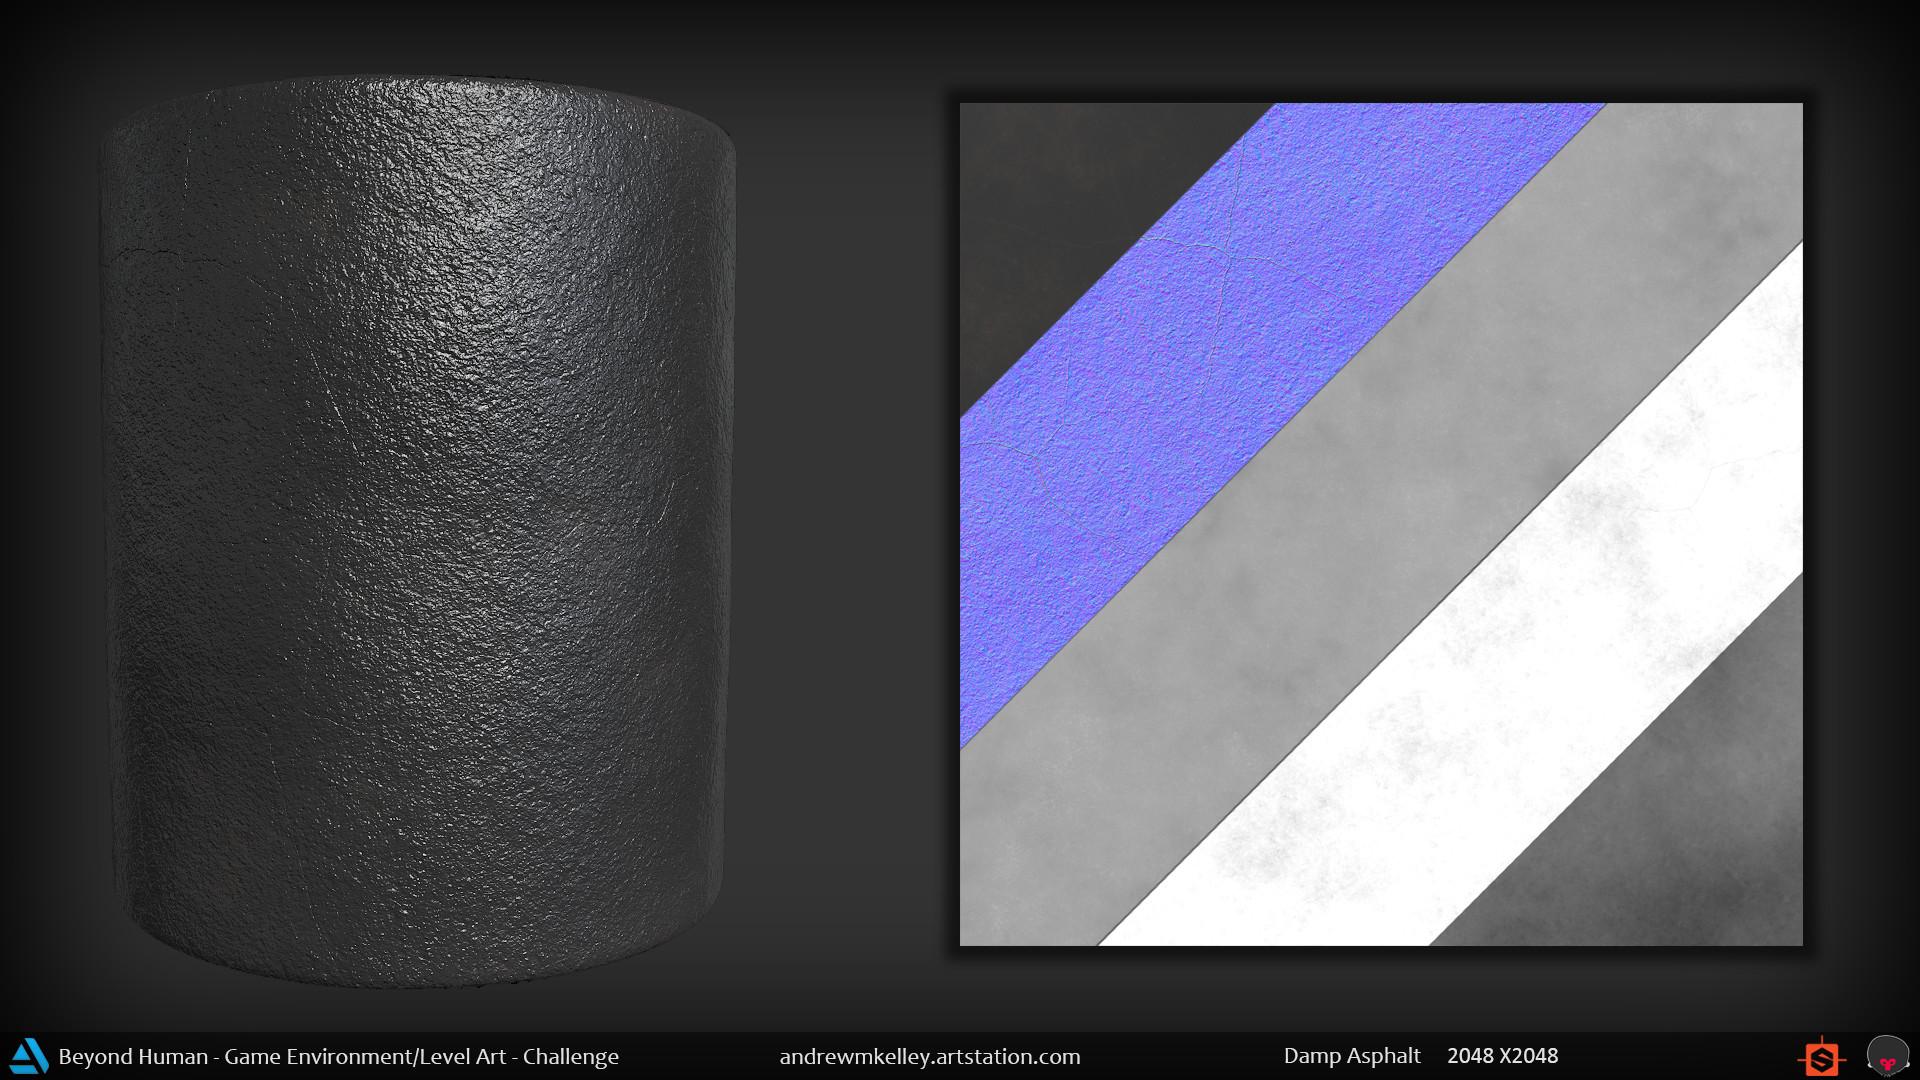 Andrew kelley materialshot dampasphalt